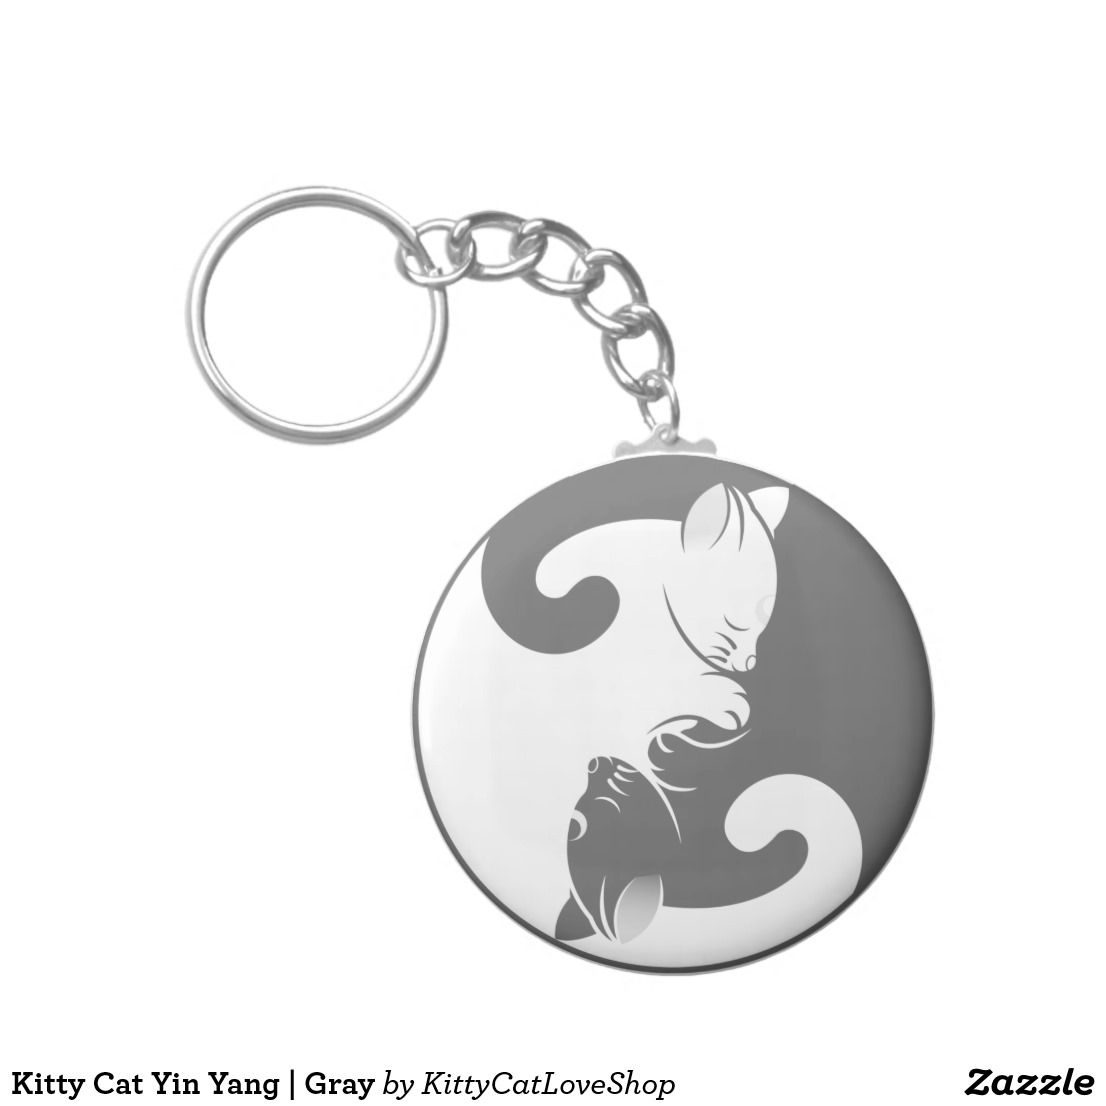 Kitty cat yin yang gray kitty cat love shop pinterest kitty